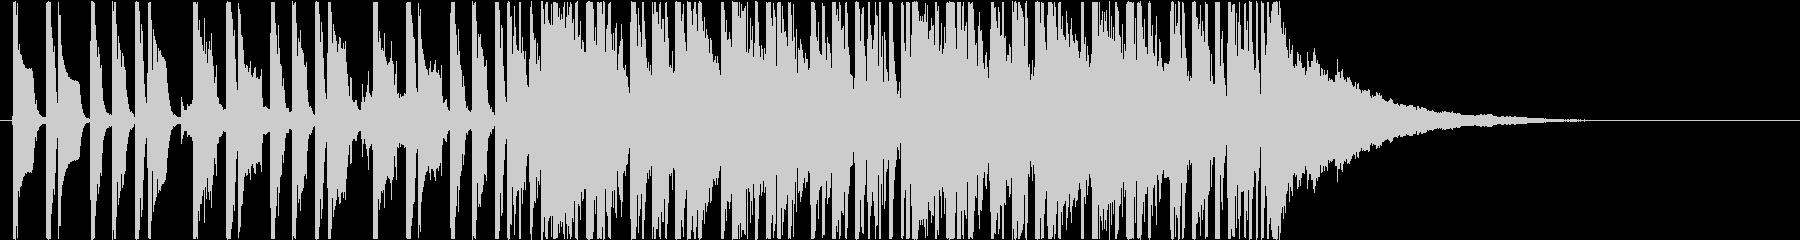 CM向けサーフロックの未再生の波形